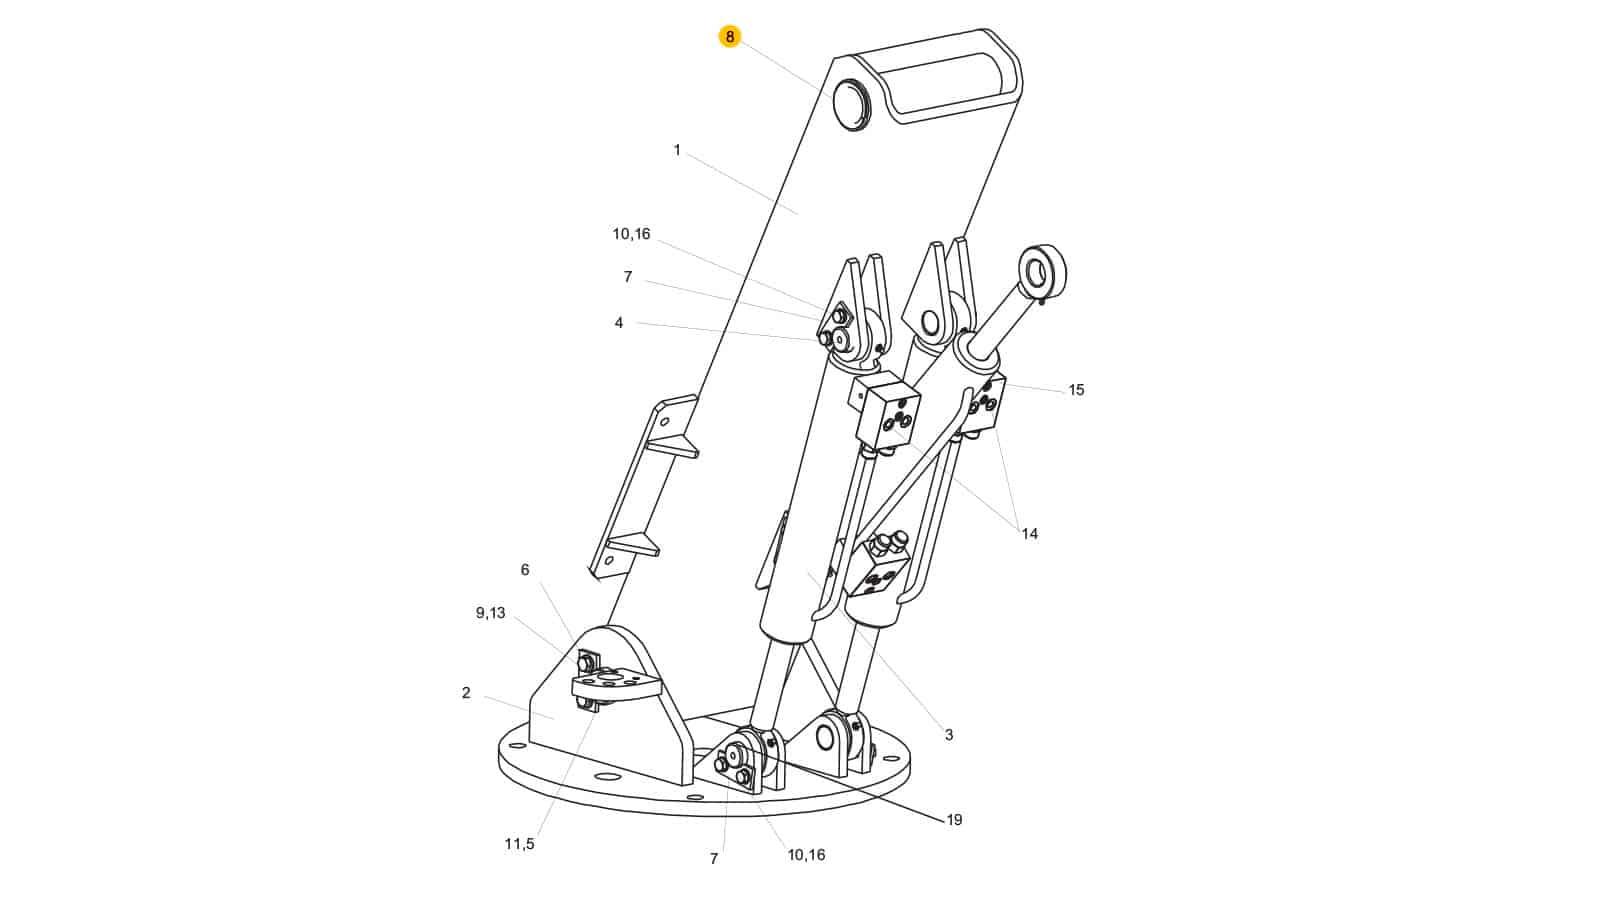 Positioner Assembly (U6) – Page 2